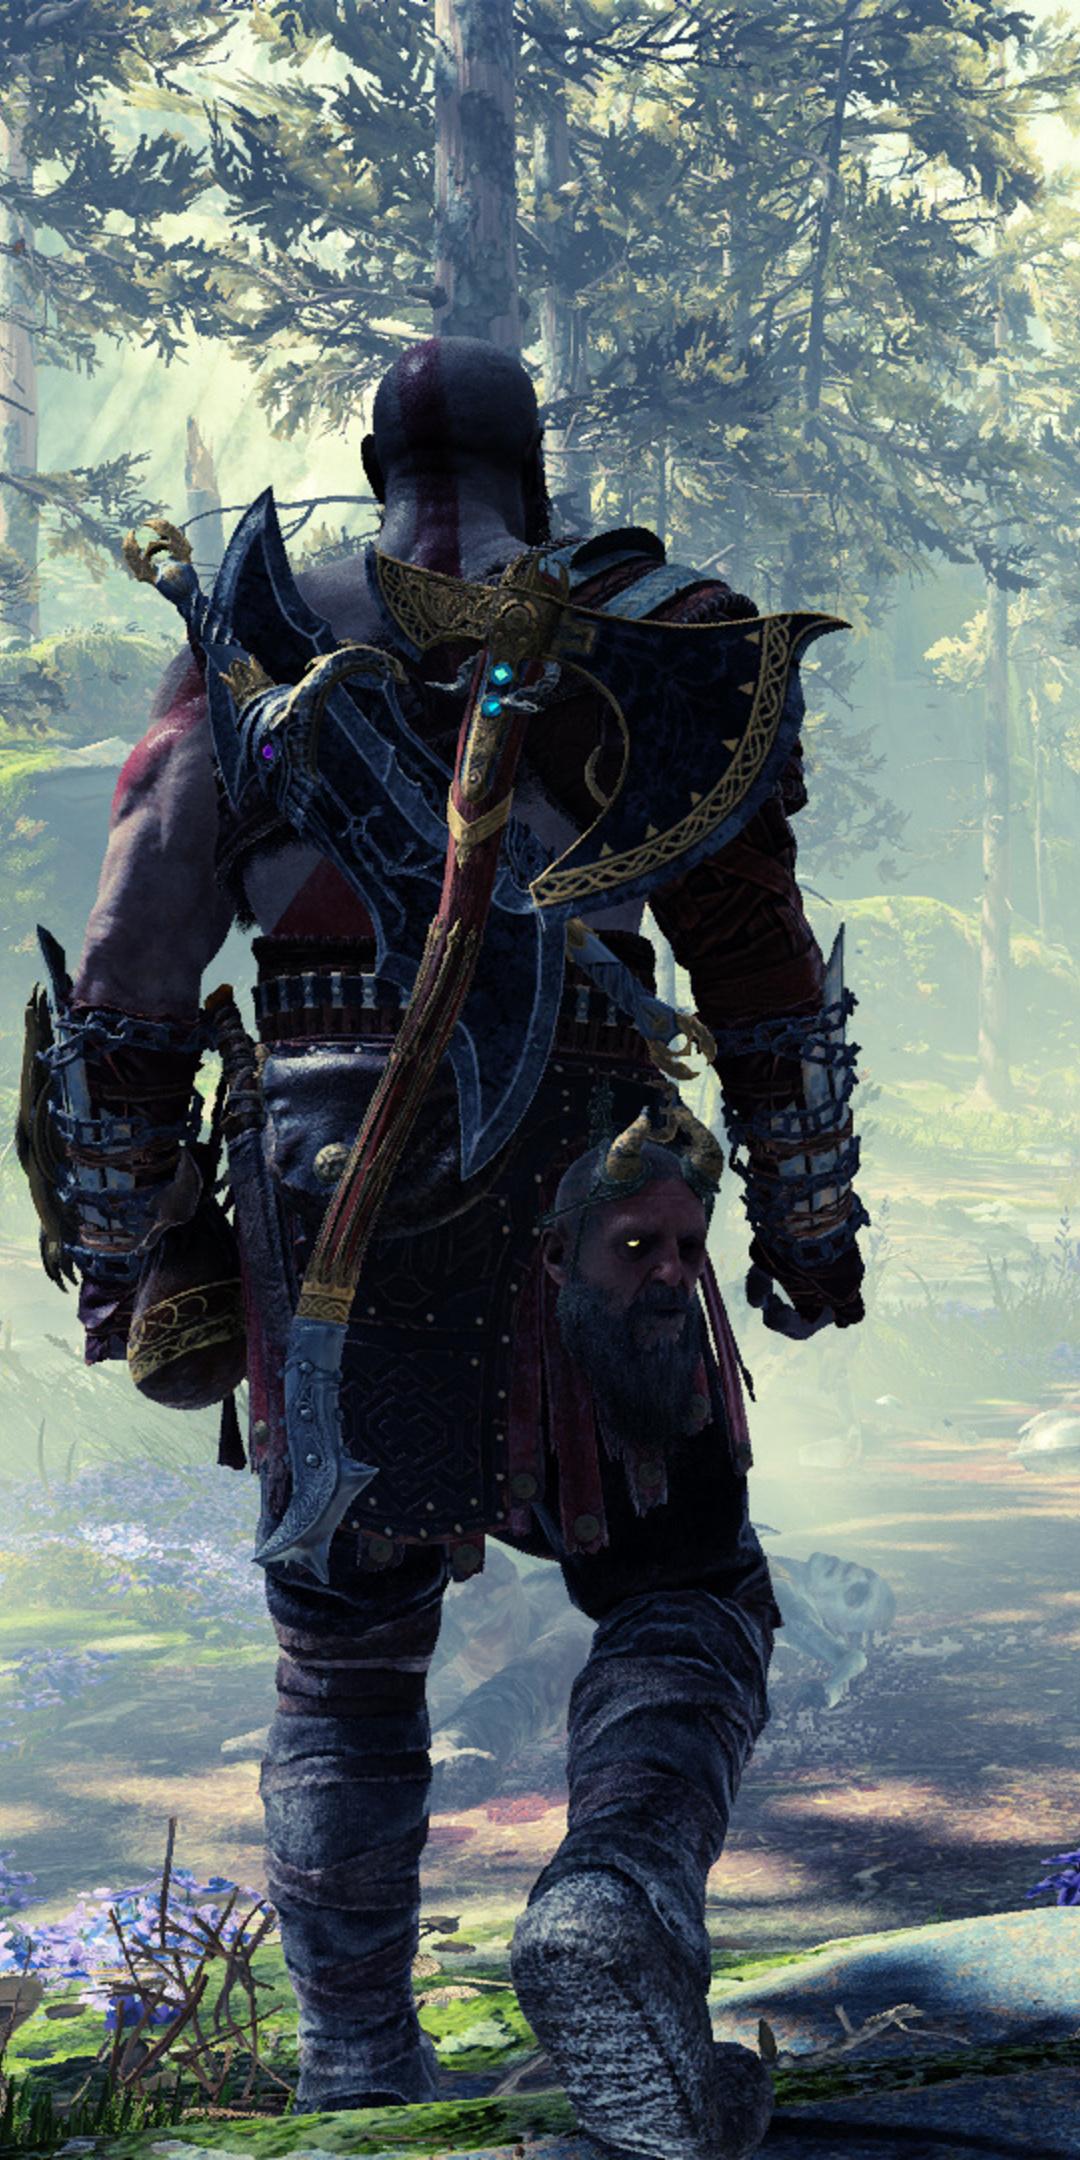 game-god-of-war-4-1080p-ly.jpg